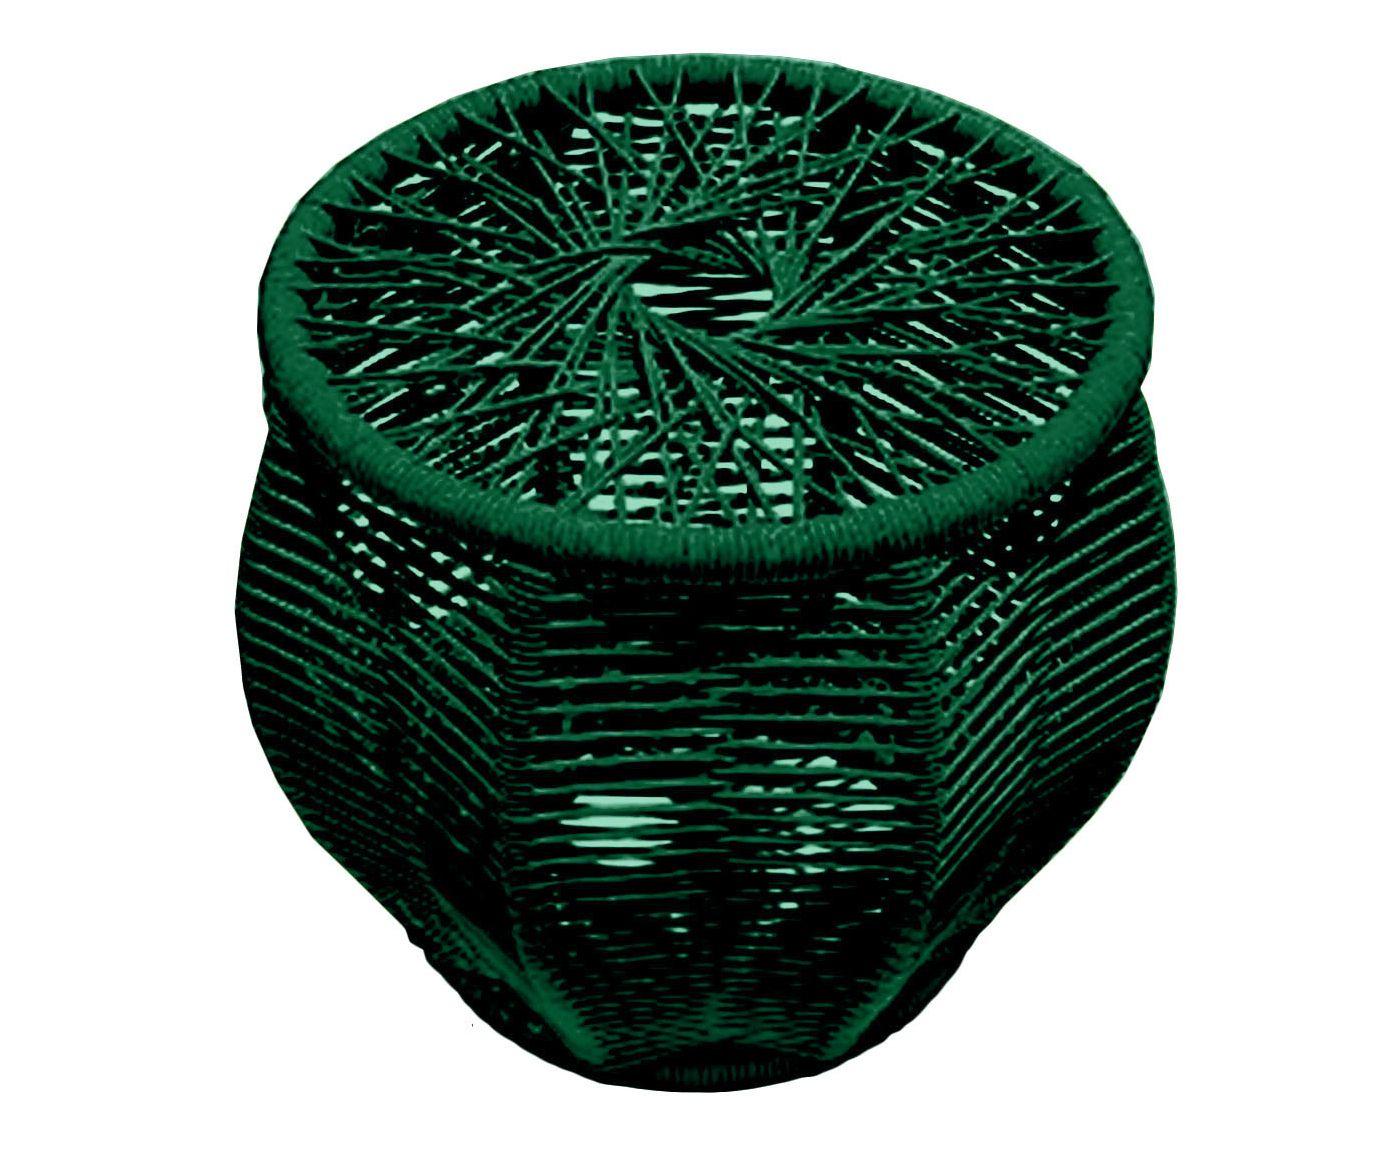 Pufe Carambola Verde Escuro - 51X54X55cm | Westwing.com.br